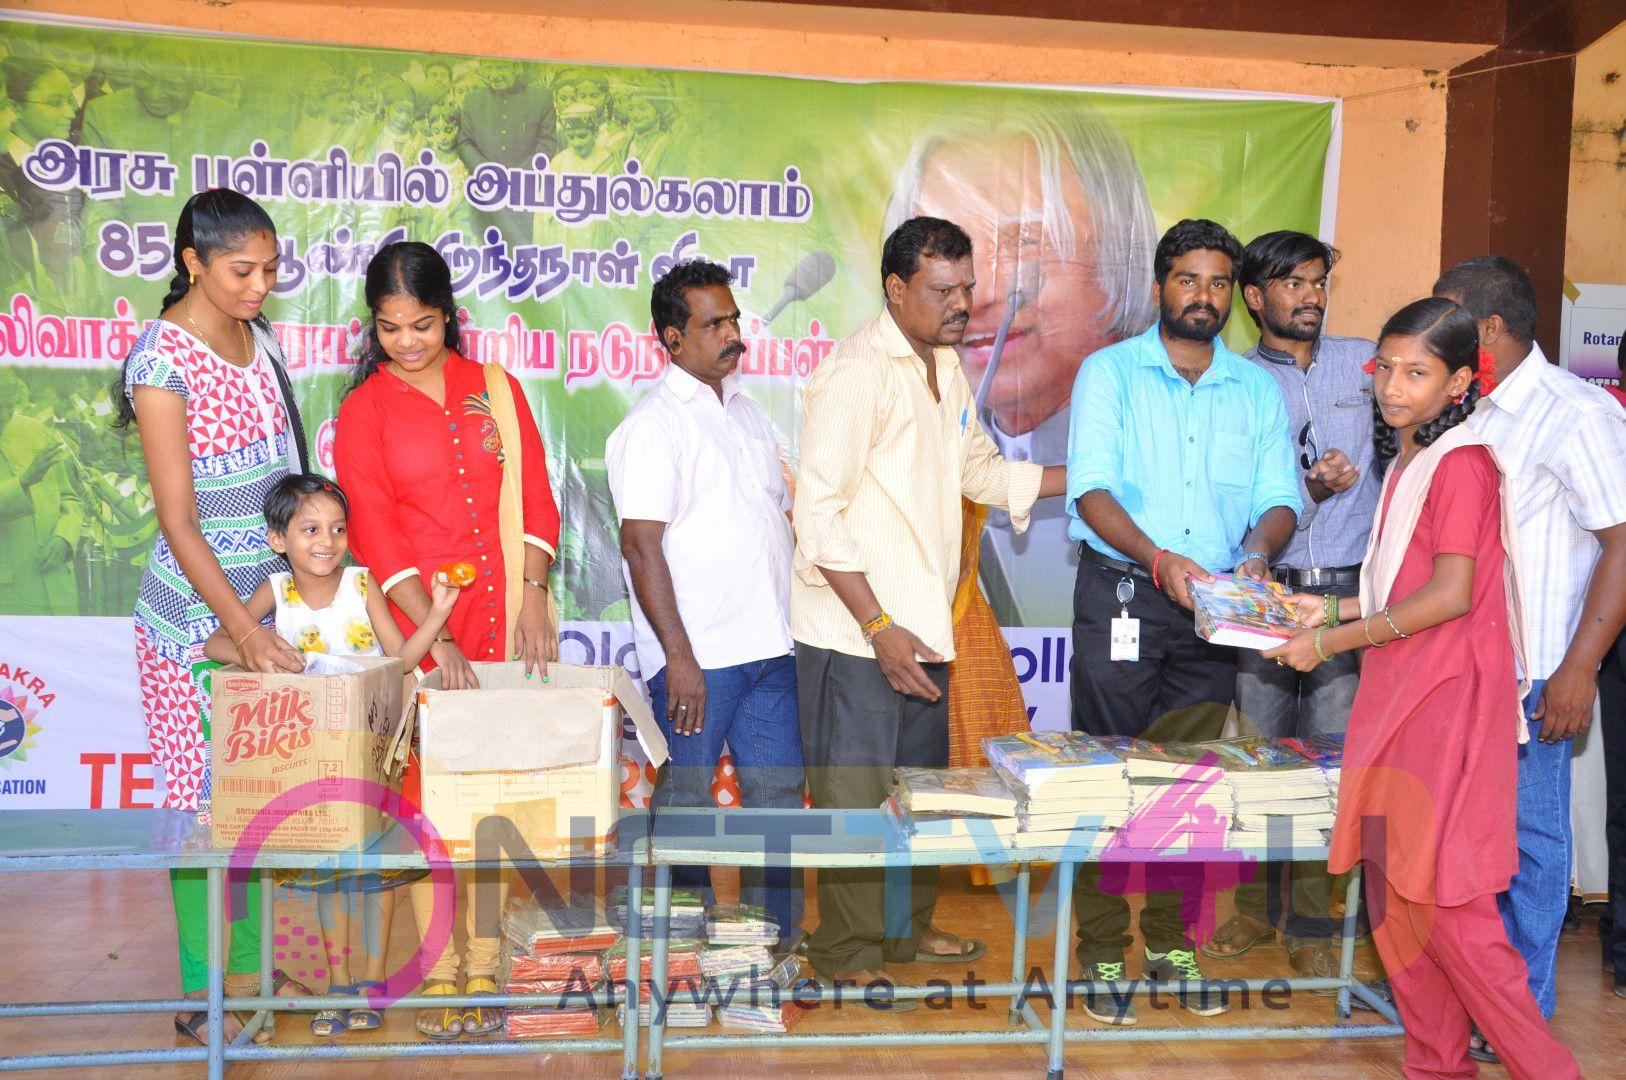 Dr. APJ Abdul Kalam Birthday Celebration At Mogappair West Govt School Enticing Photos